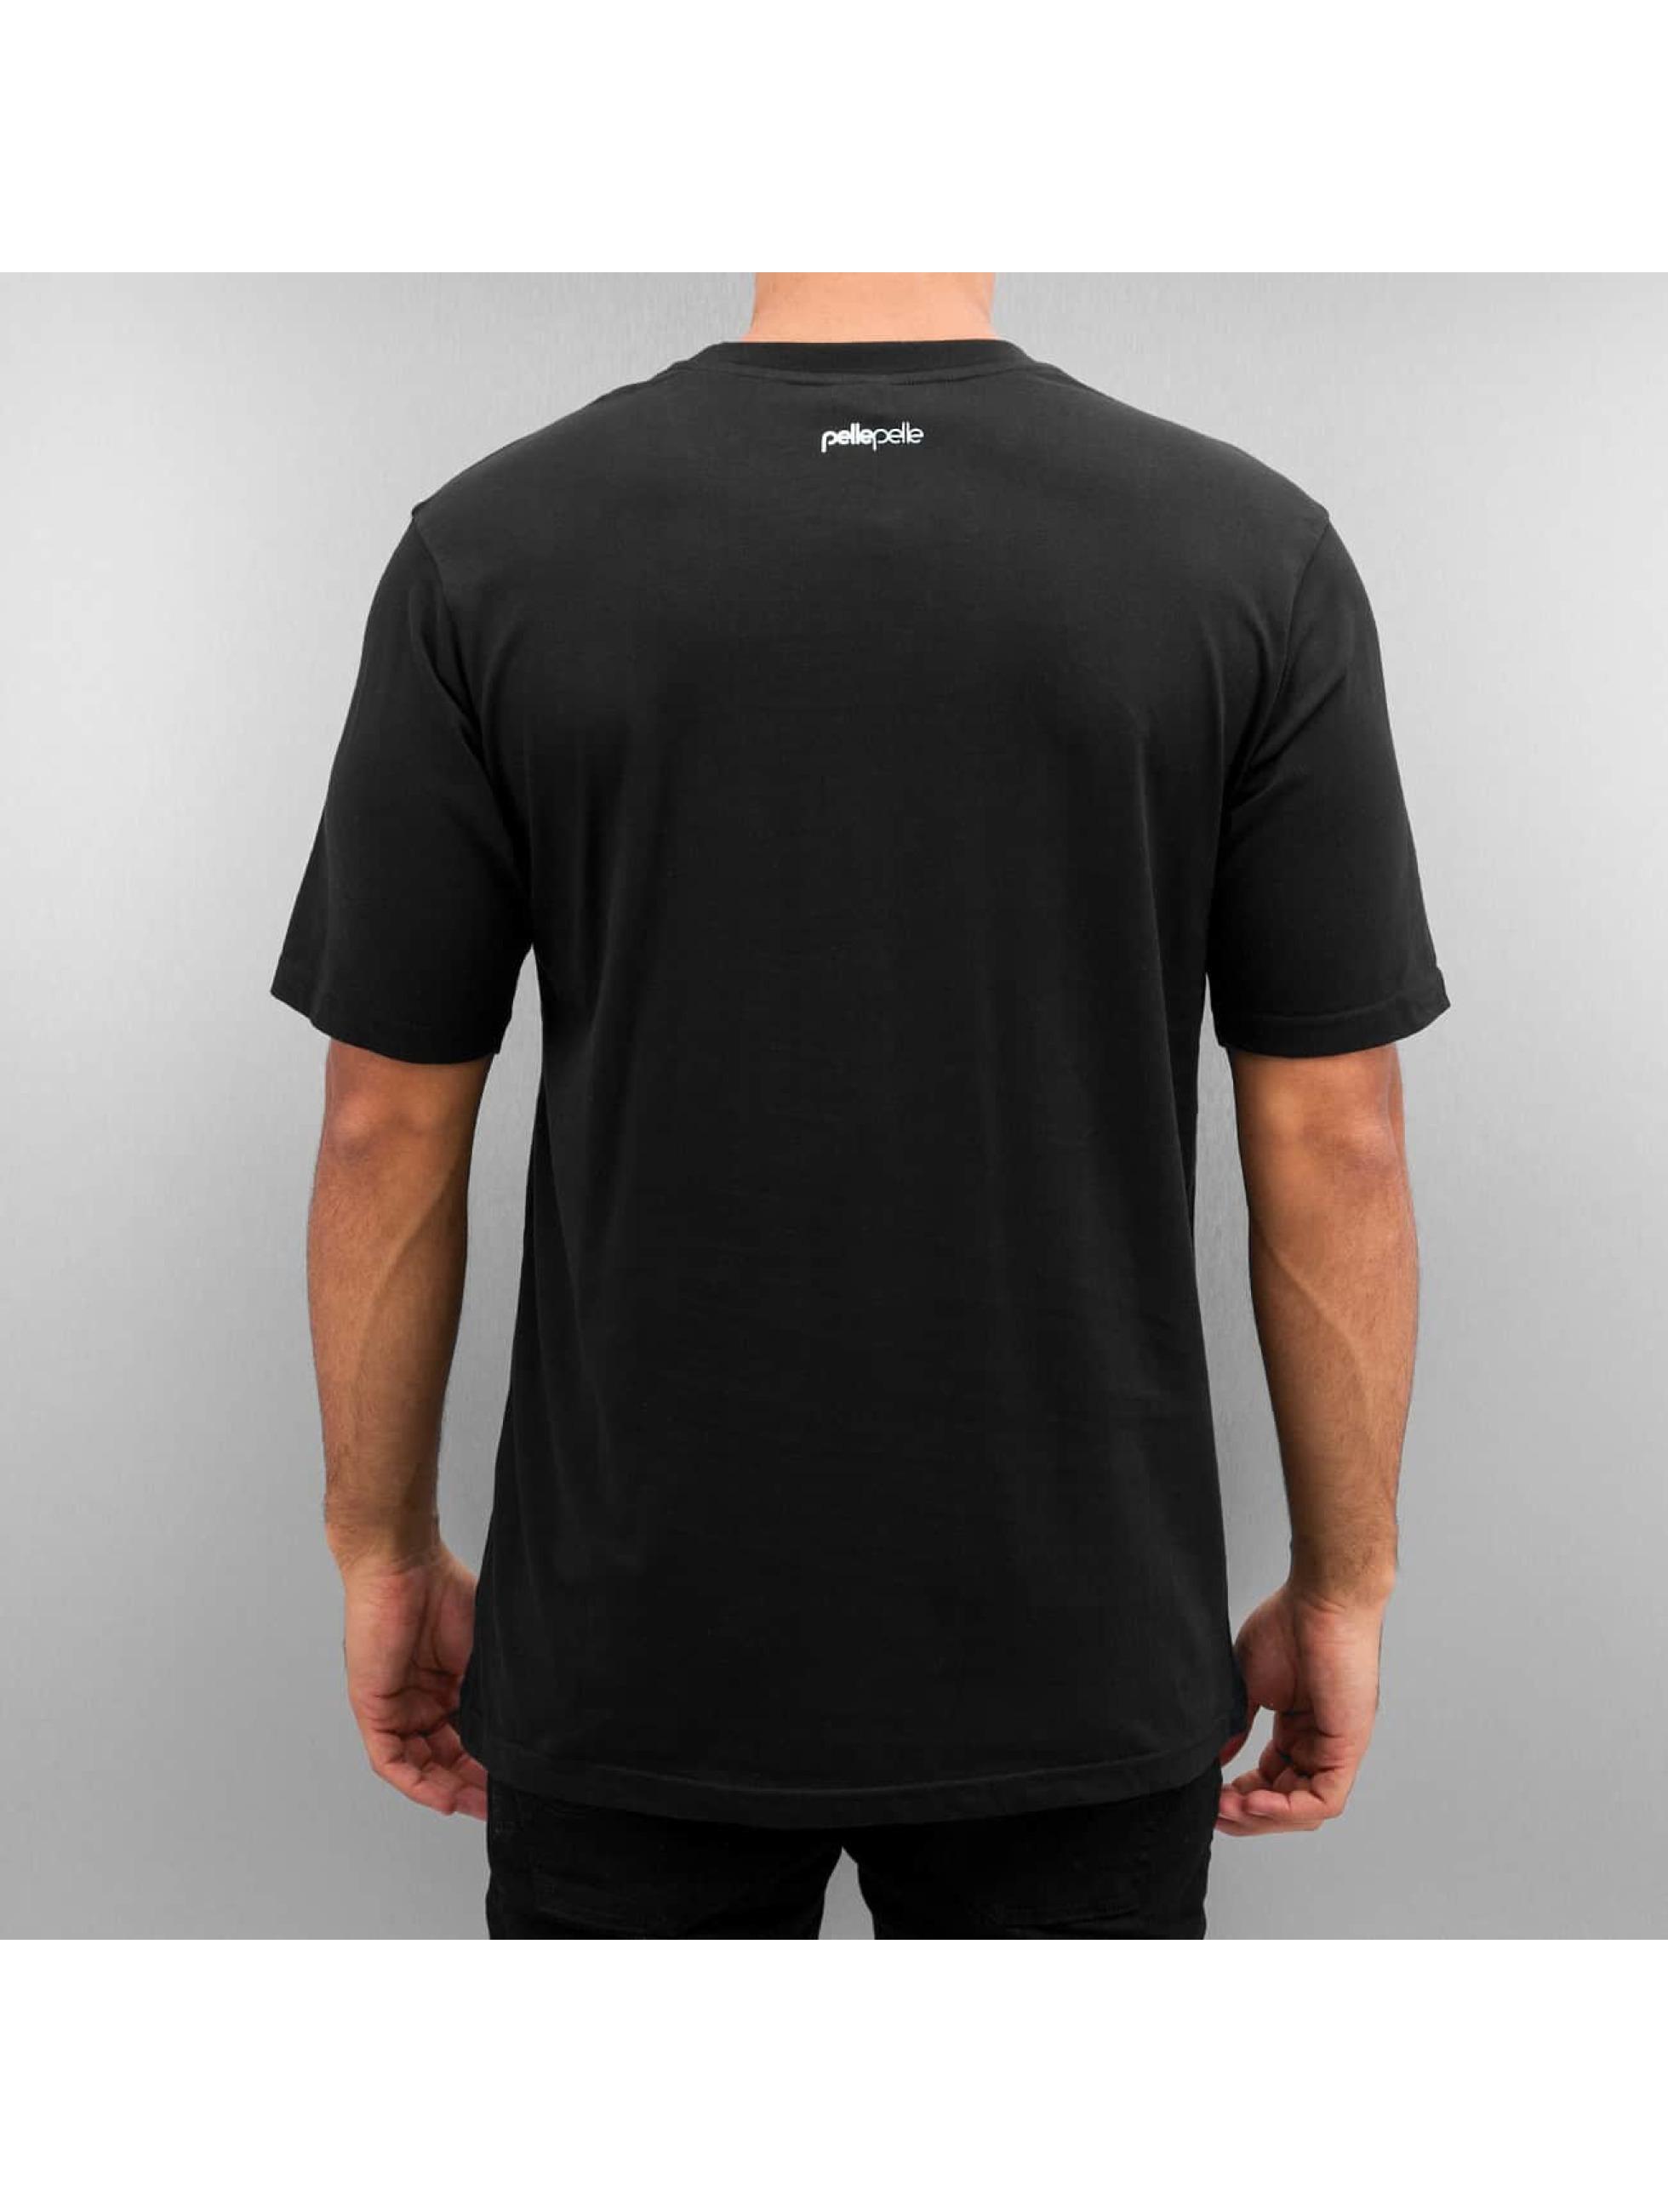 Pelle Pelle T-shirts All Time High sort